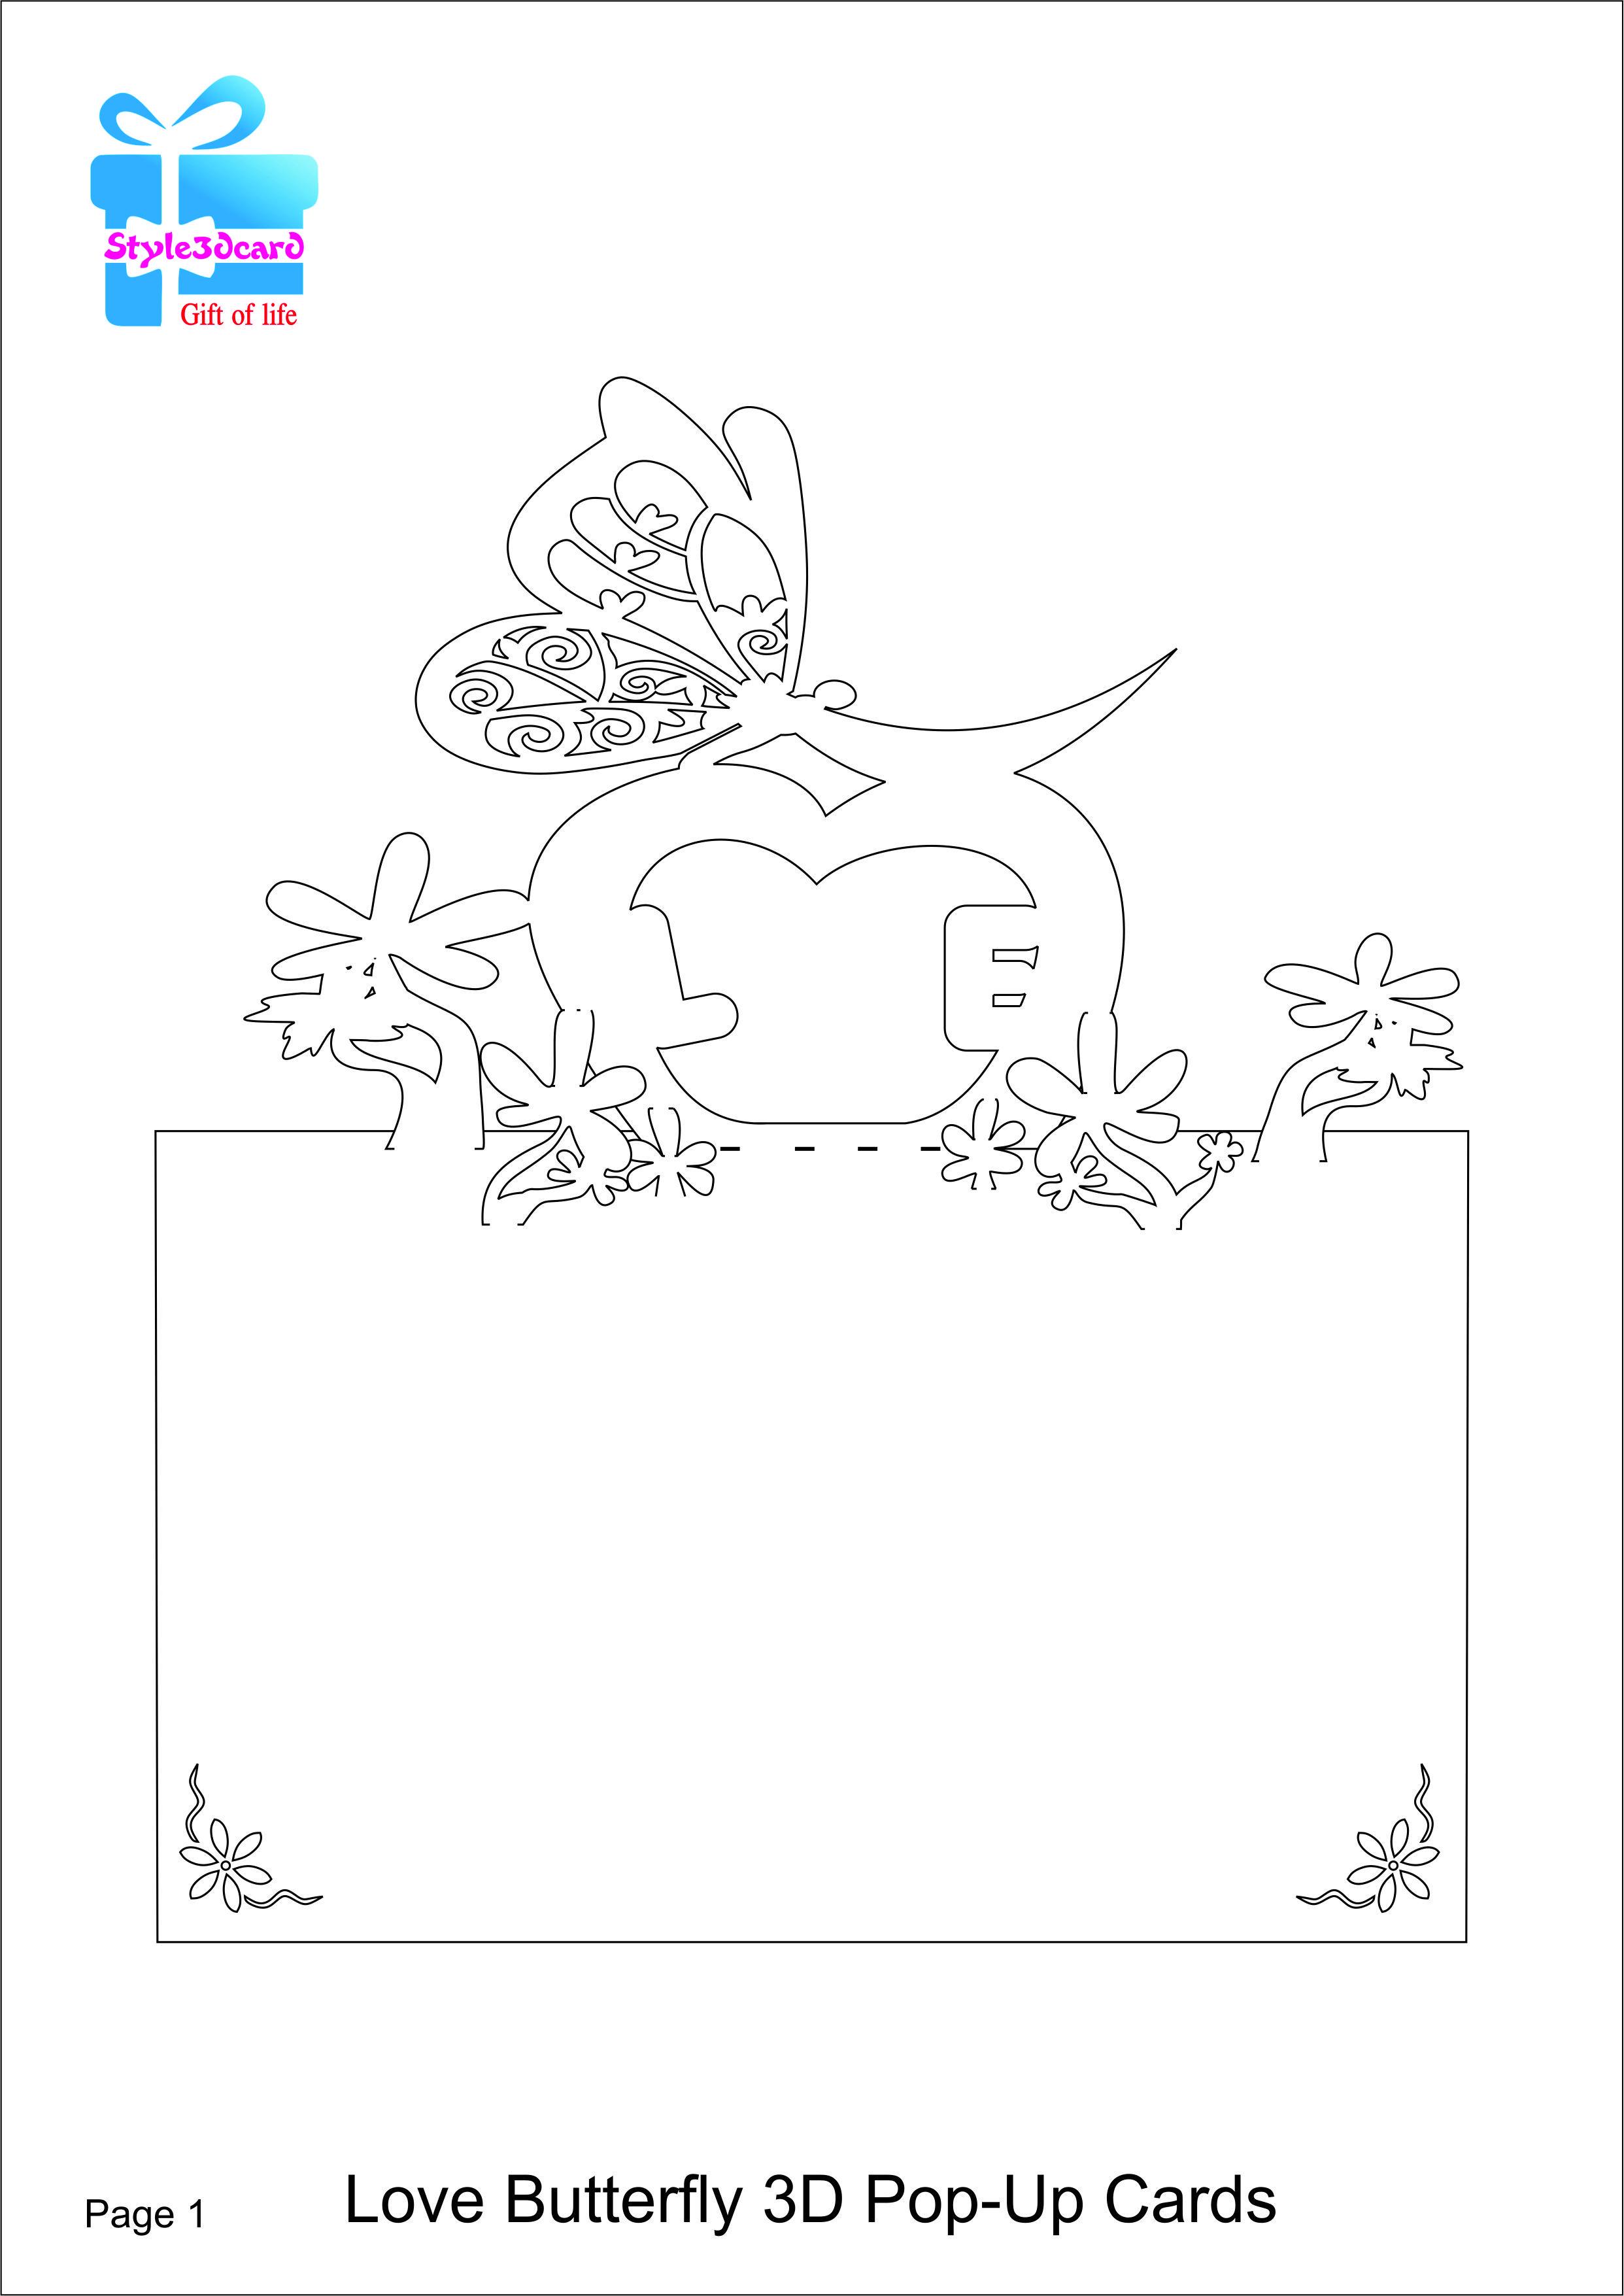 Love Butterfly 3D Pop-Up Card/kirigami pattern 1 | Pop-up ... - photo#17